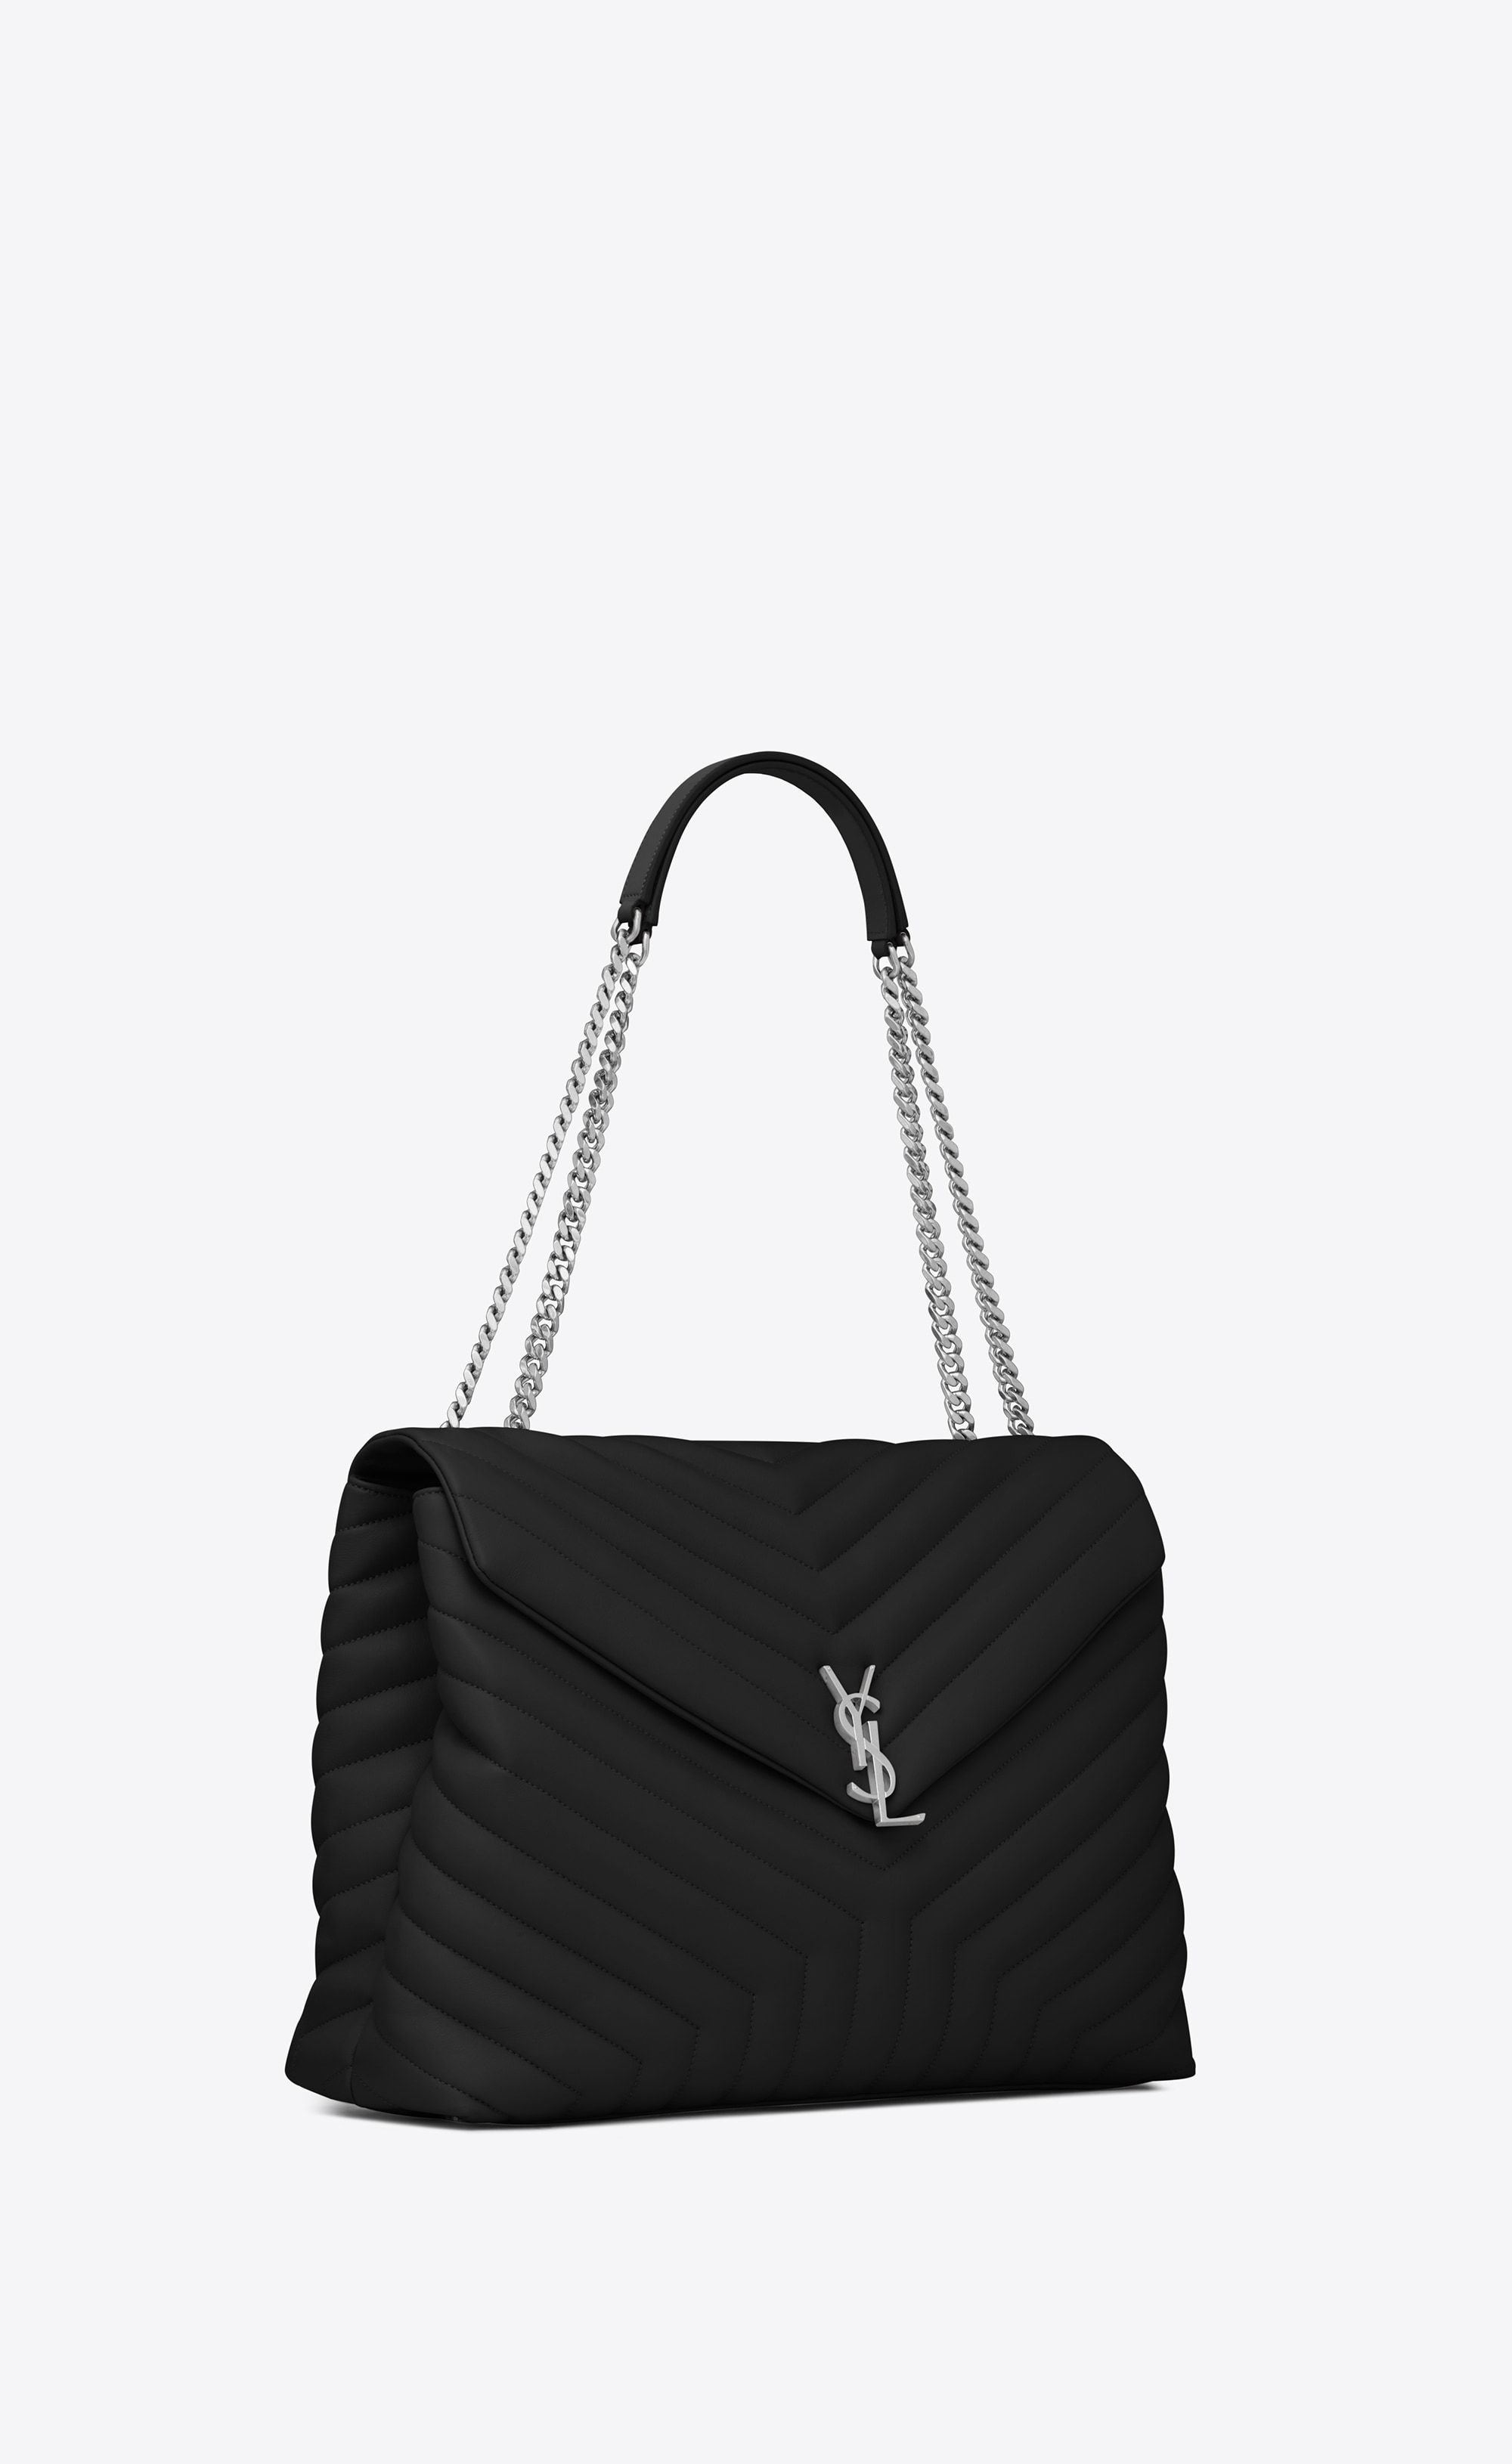 7292940fdae2e Saint Laurent - Large Loulou chain bag in black